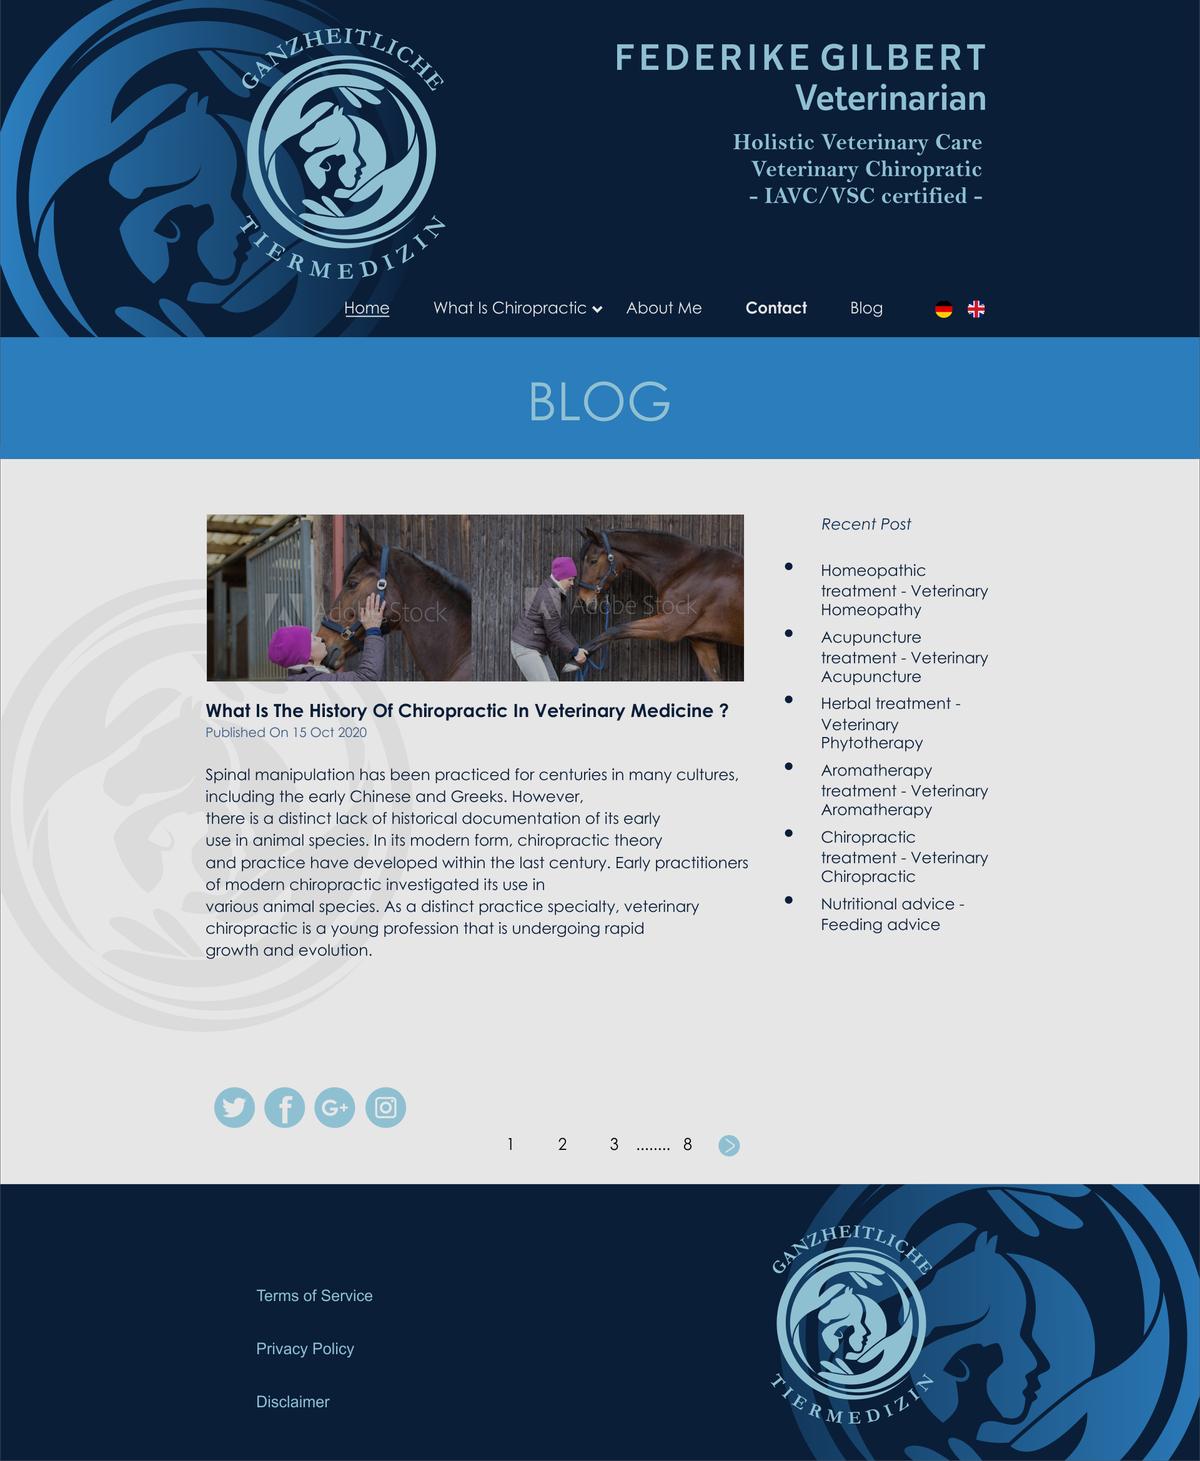 Website design with the logo you just designed